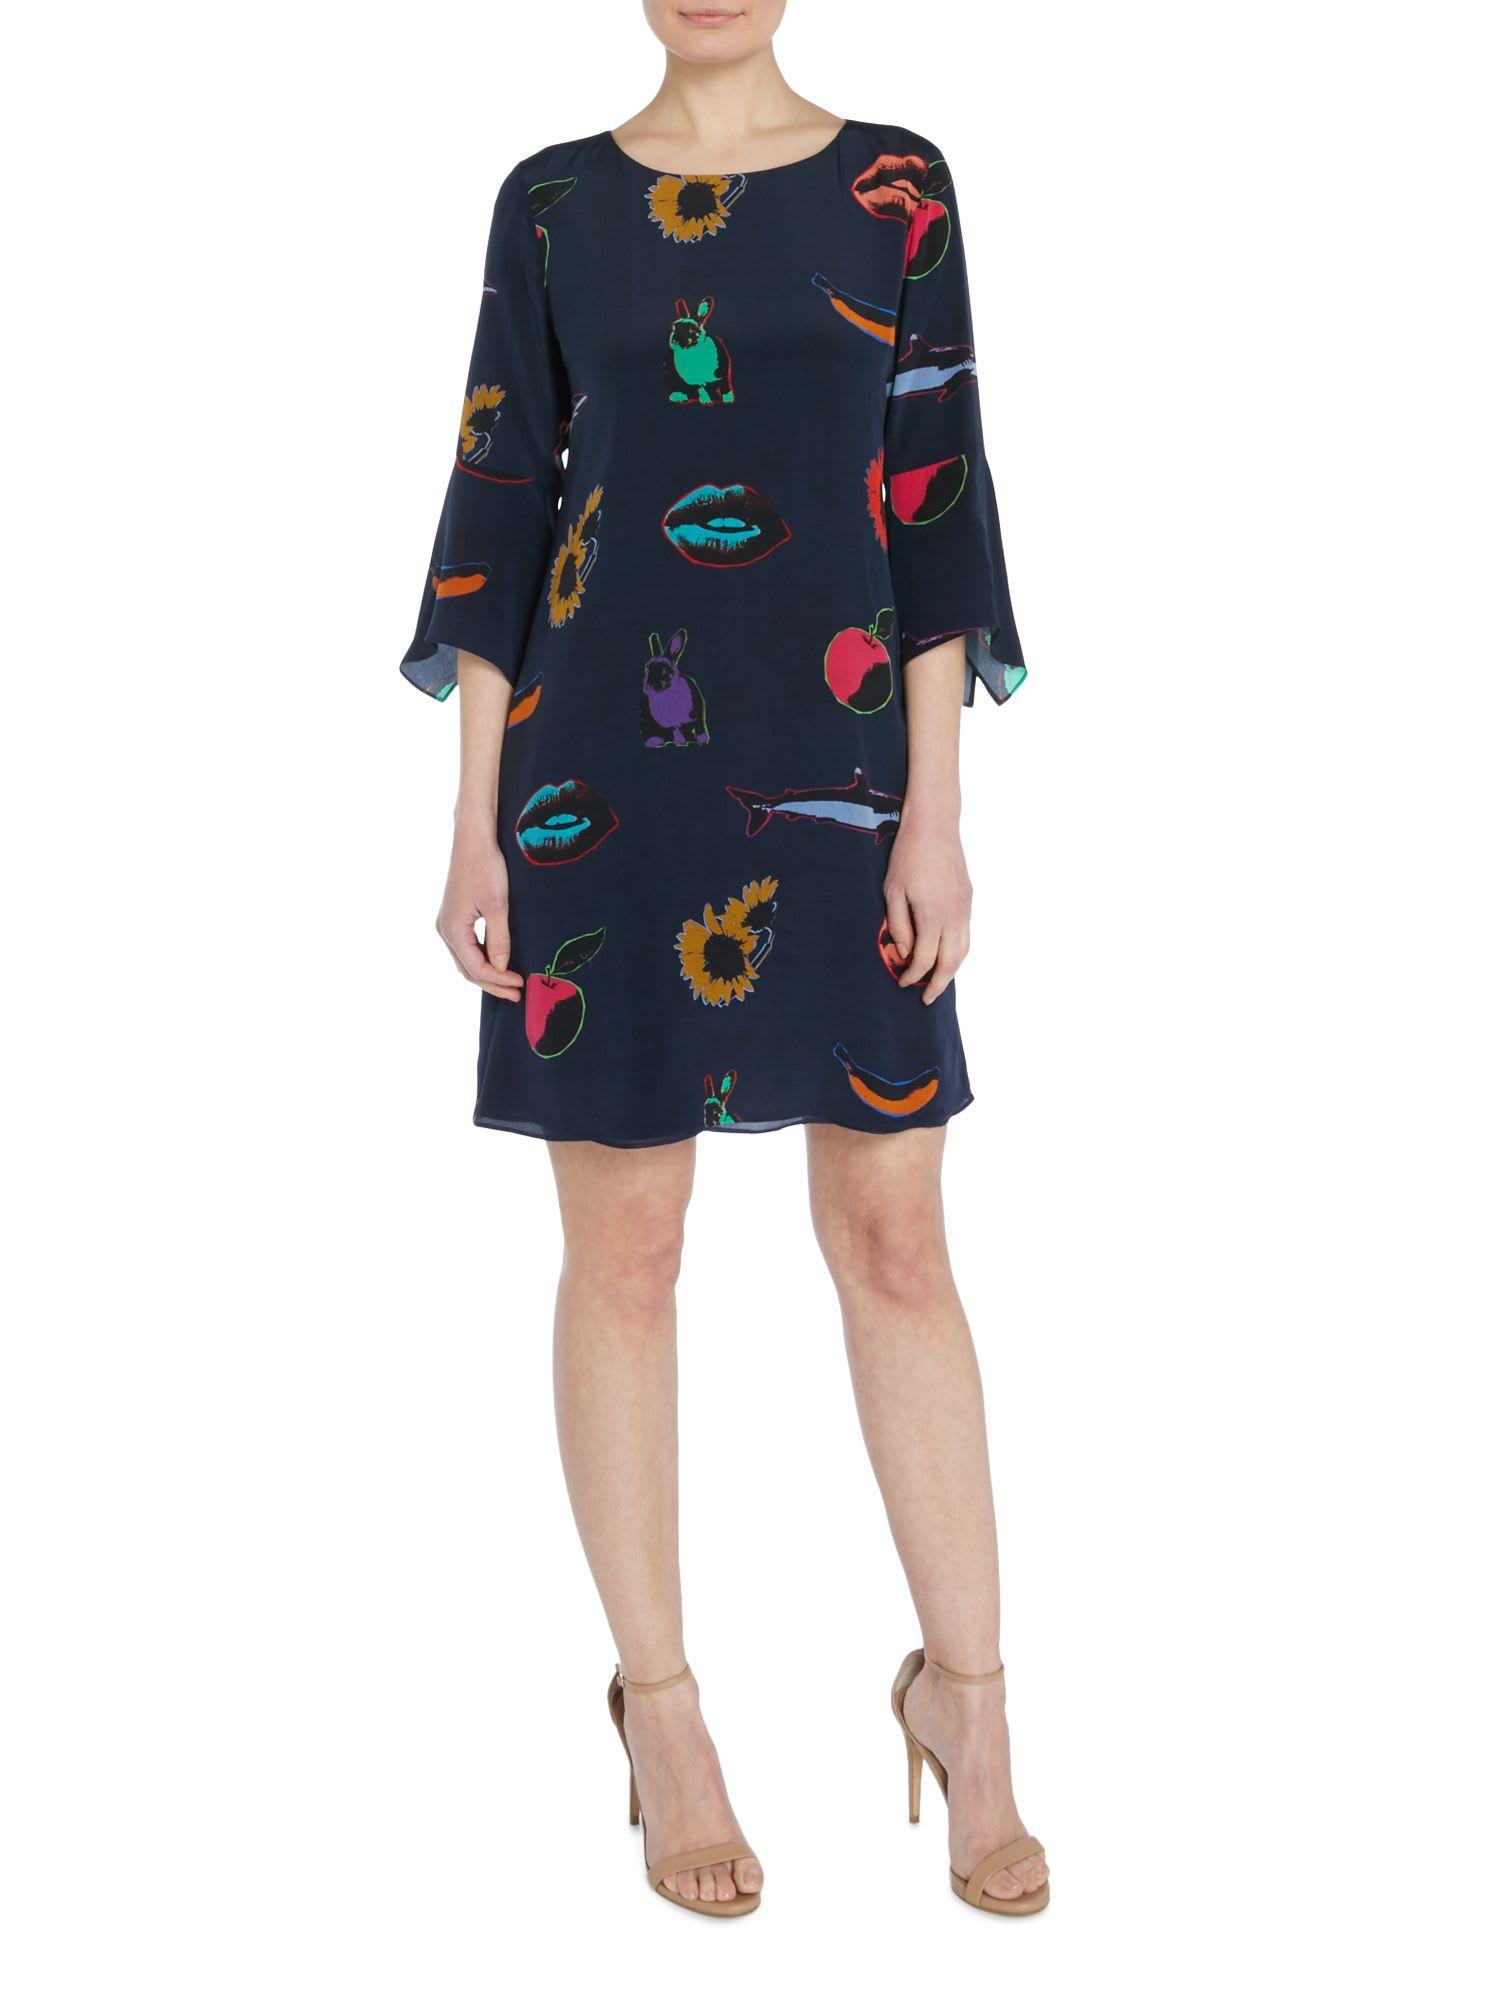 Paul Smith Artful Lives Silk Printed Tunic Dress